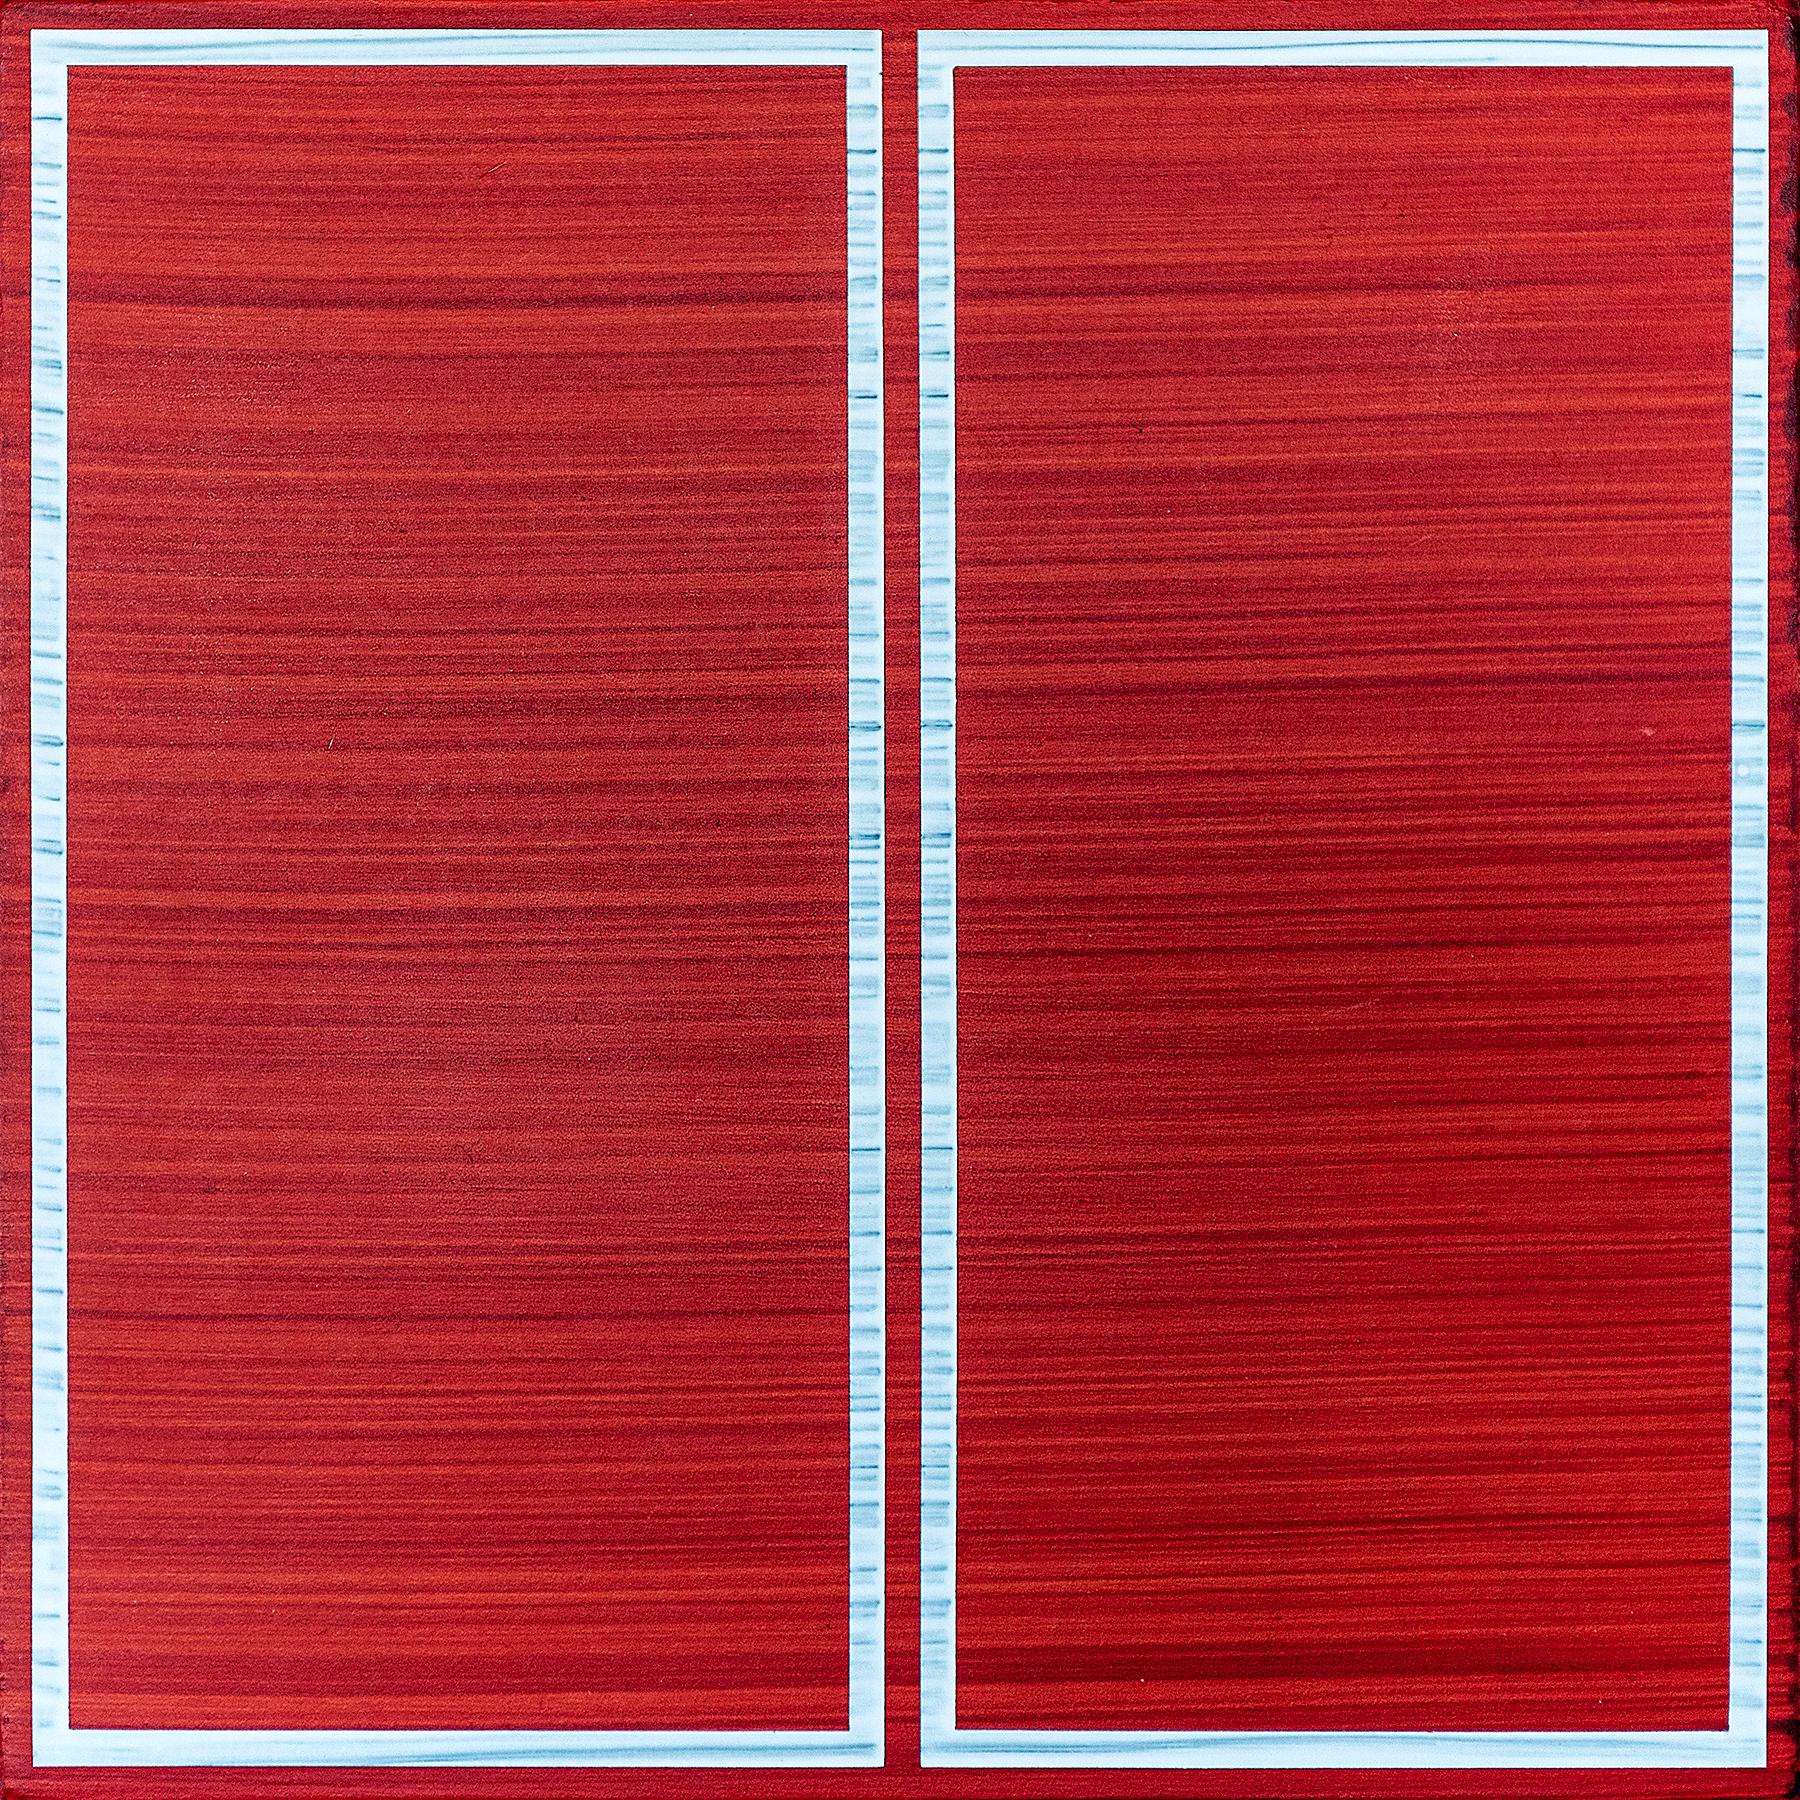 Gemini #03, 12 x 12 inches / 30.5 x 30.5 cm, acrylic on muslin on panel, 2018